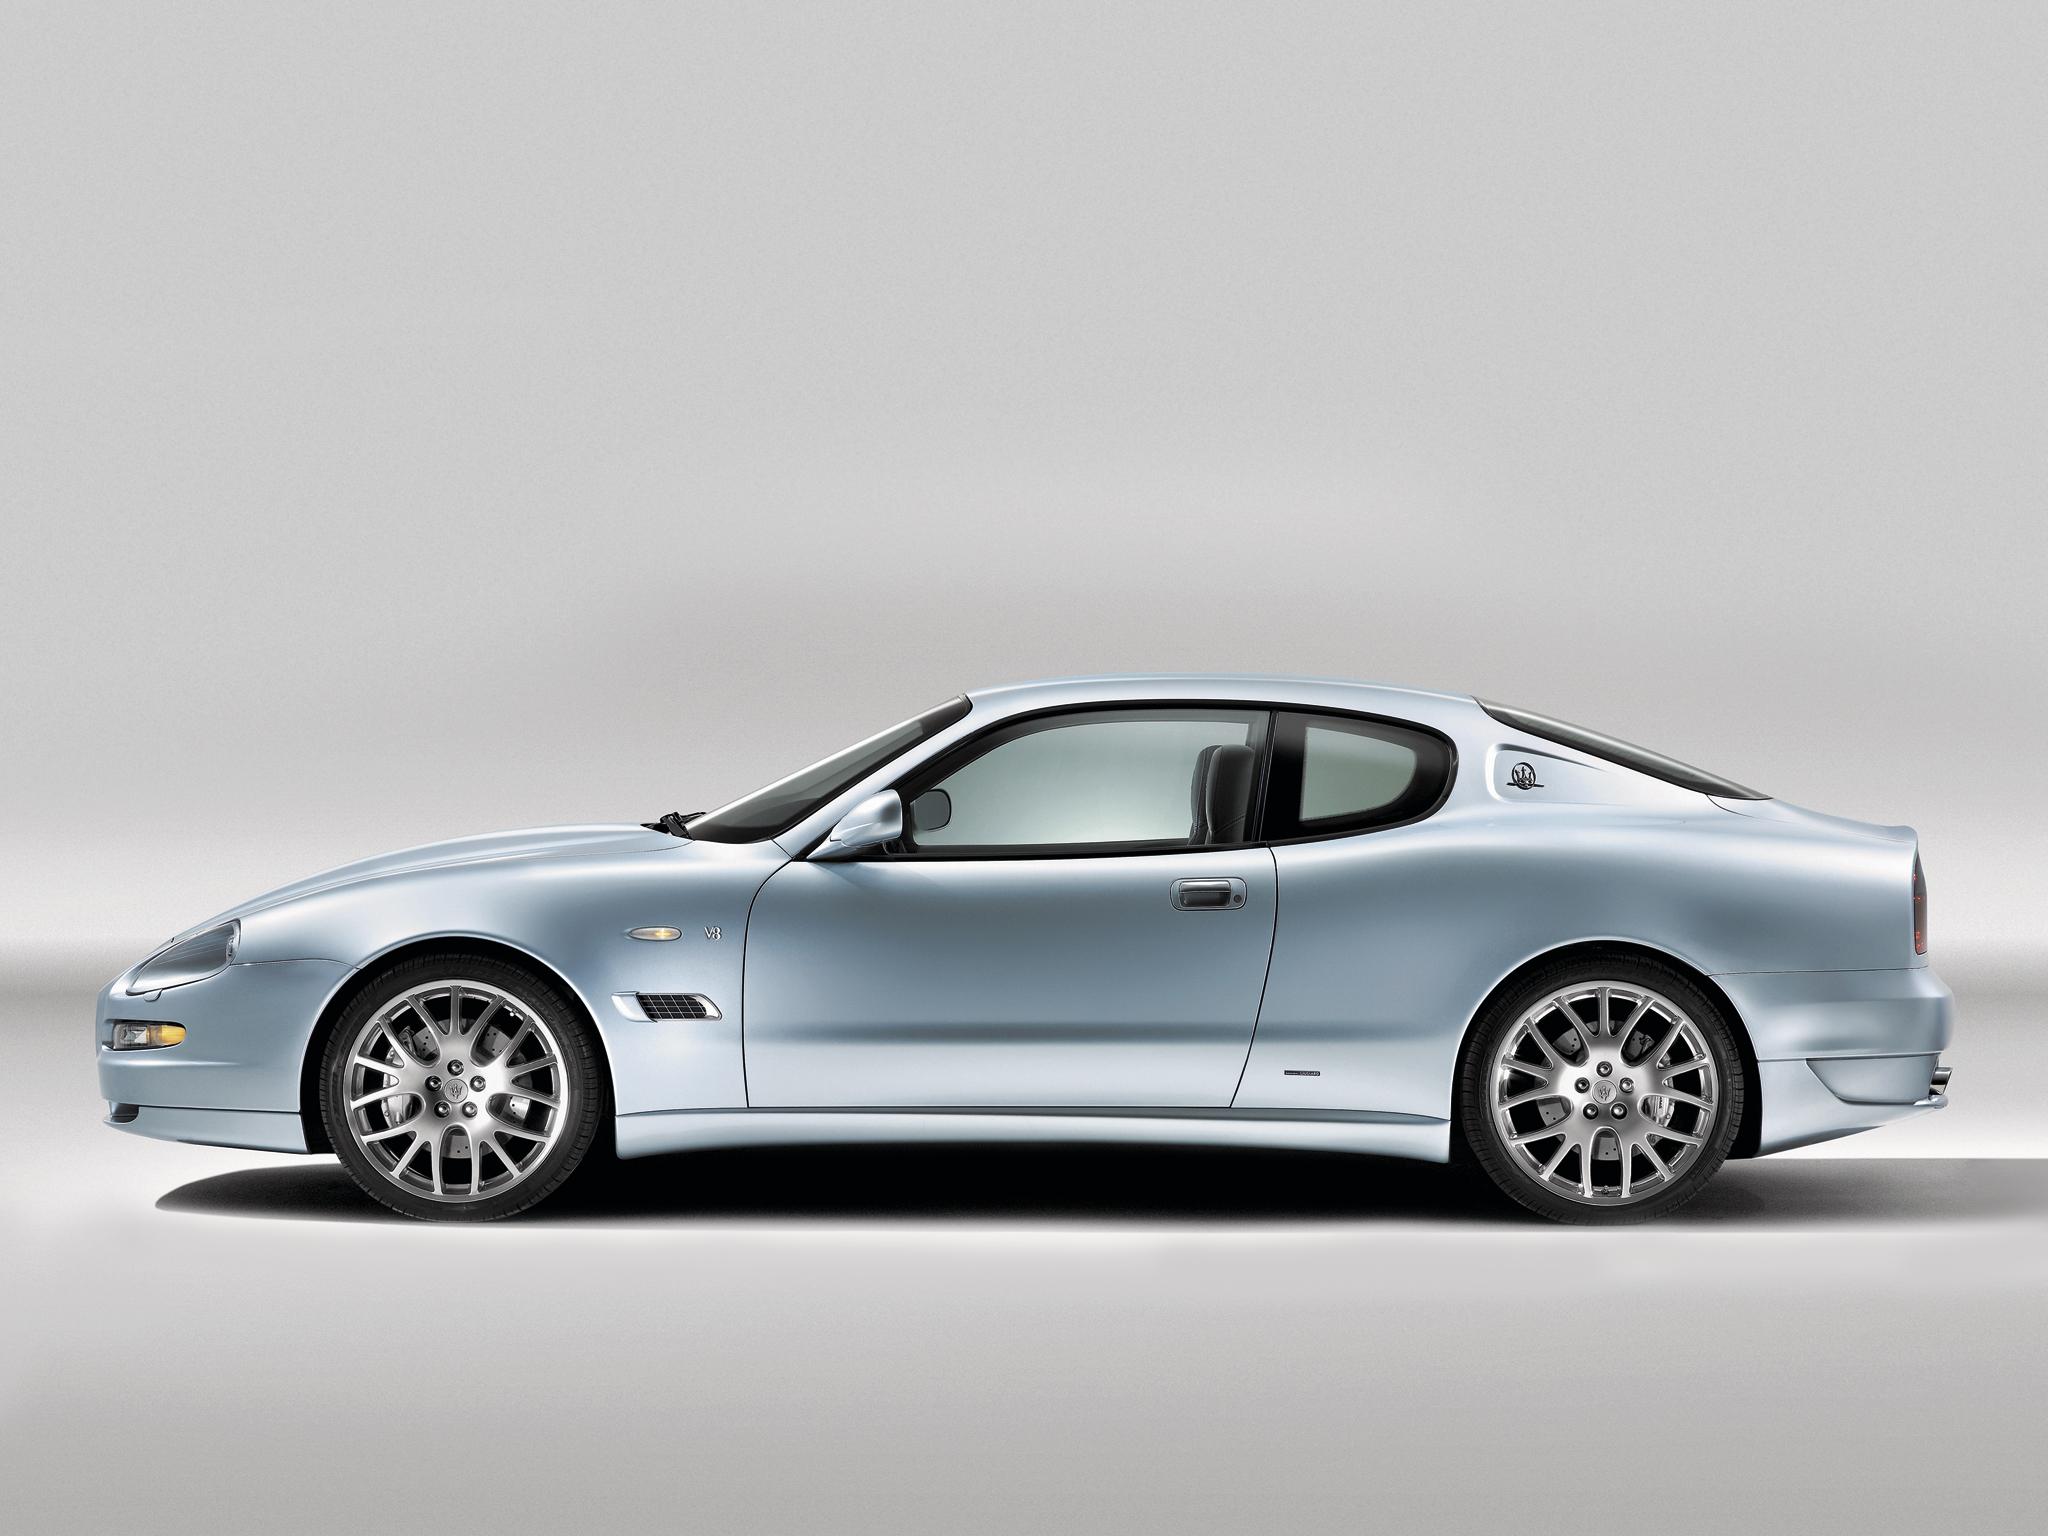 2004 Maserati Coupe 40 Car Desktop Background